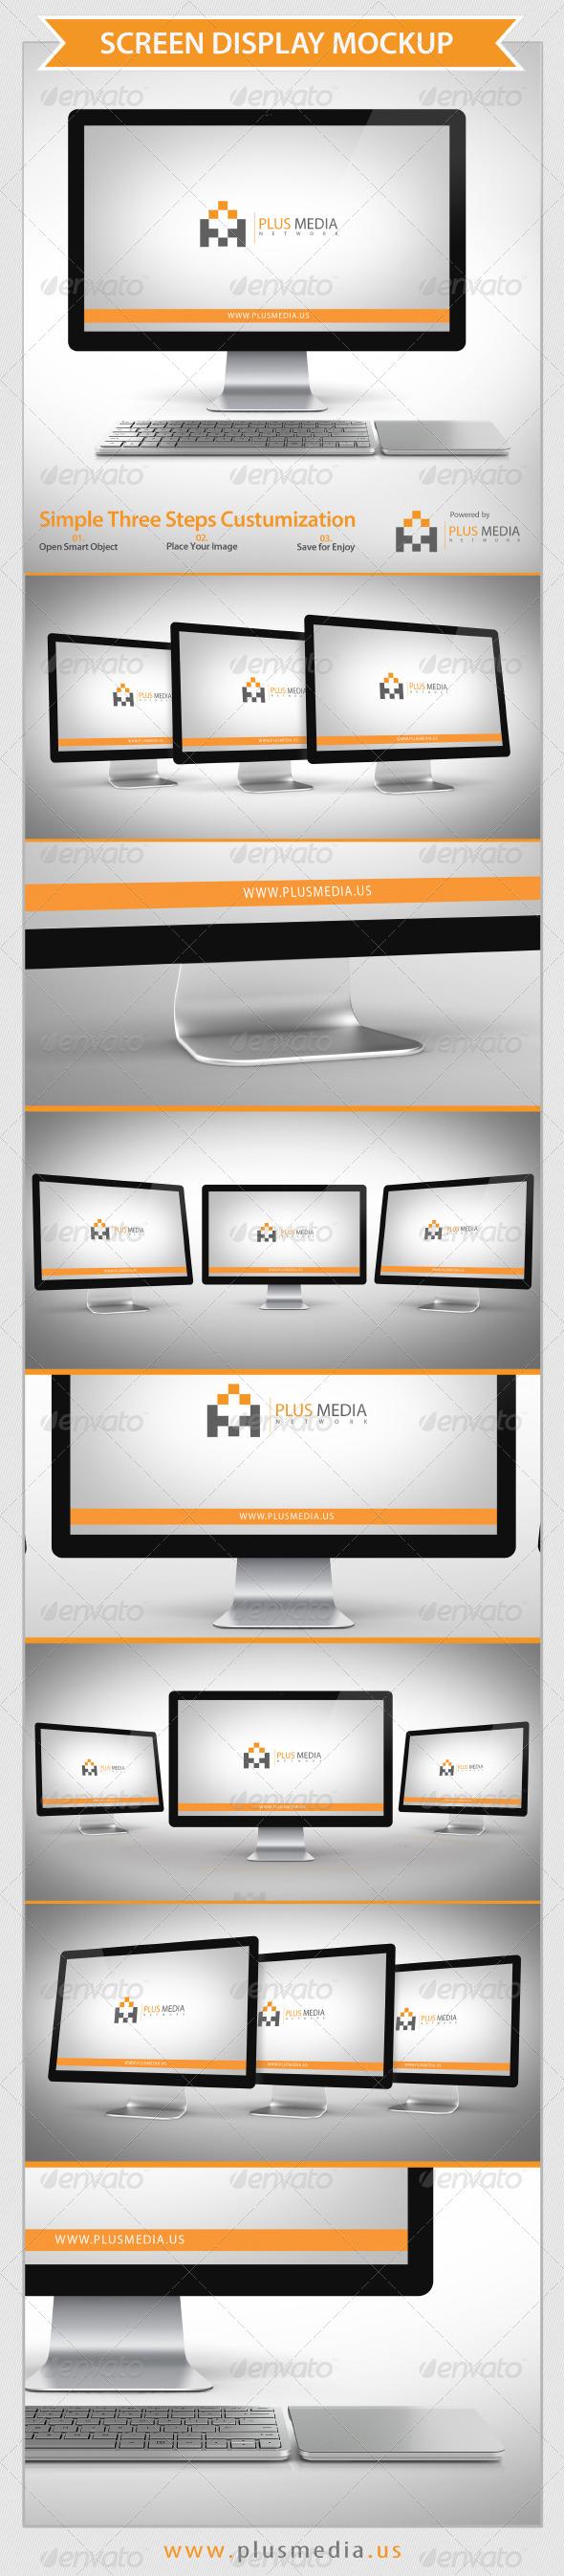 GraphicRiver Screen Display Mockup 6573446